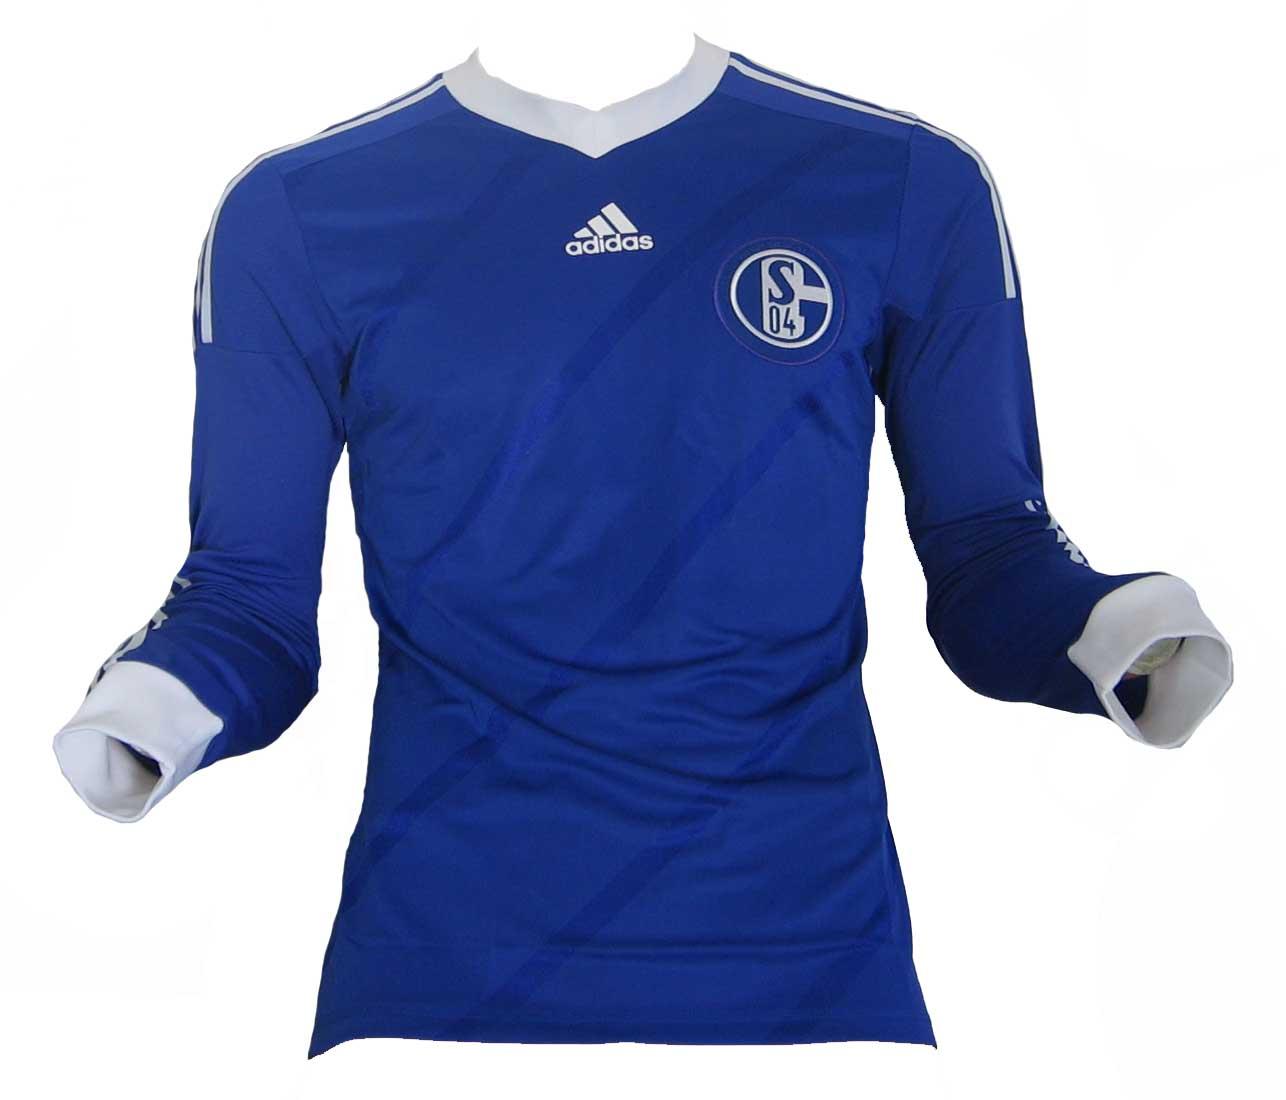 Fc Schalke 04 Trikot 201314 Home Adidas Spielered House Of Shirts